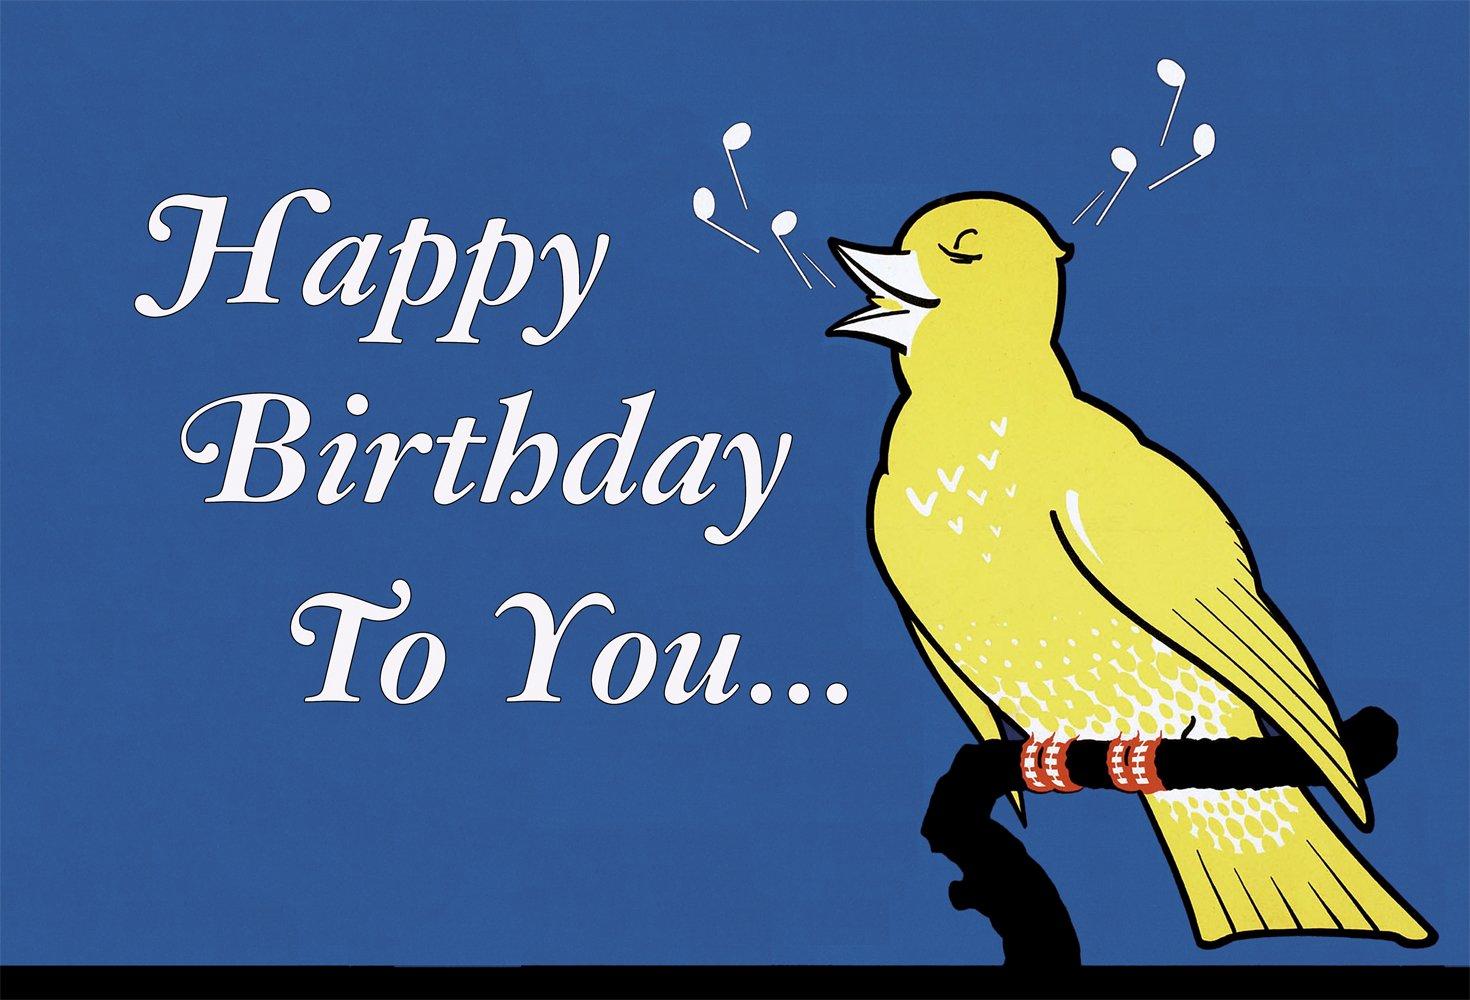 Happy Birthday to YOU - Singing Bird Birthday Card: Elephant